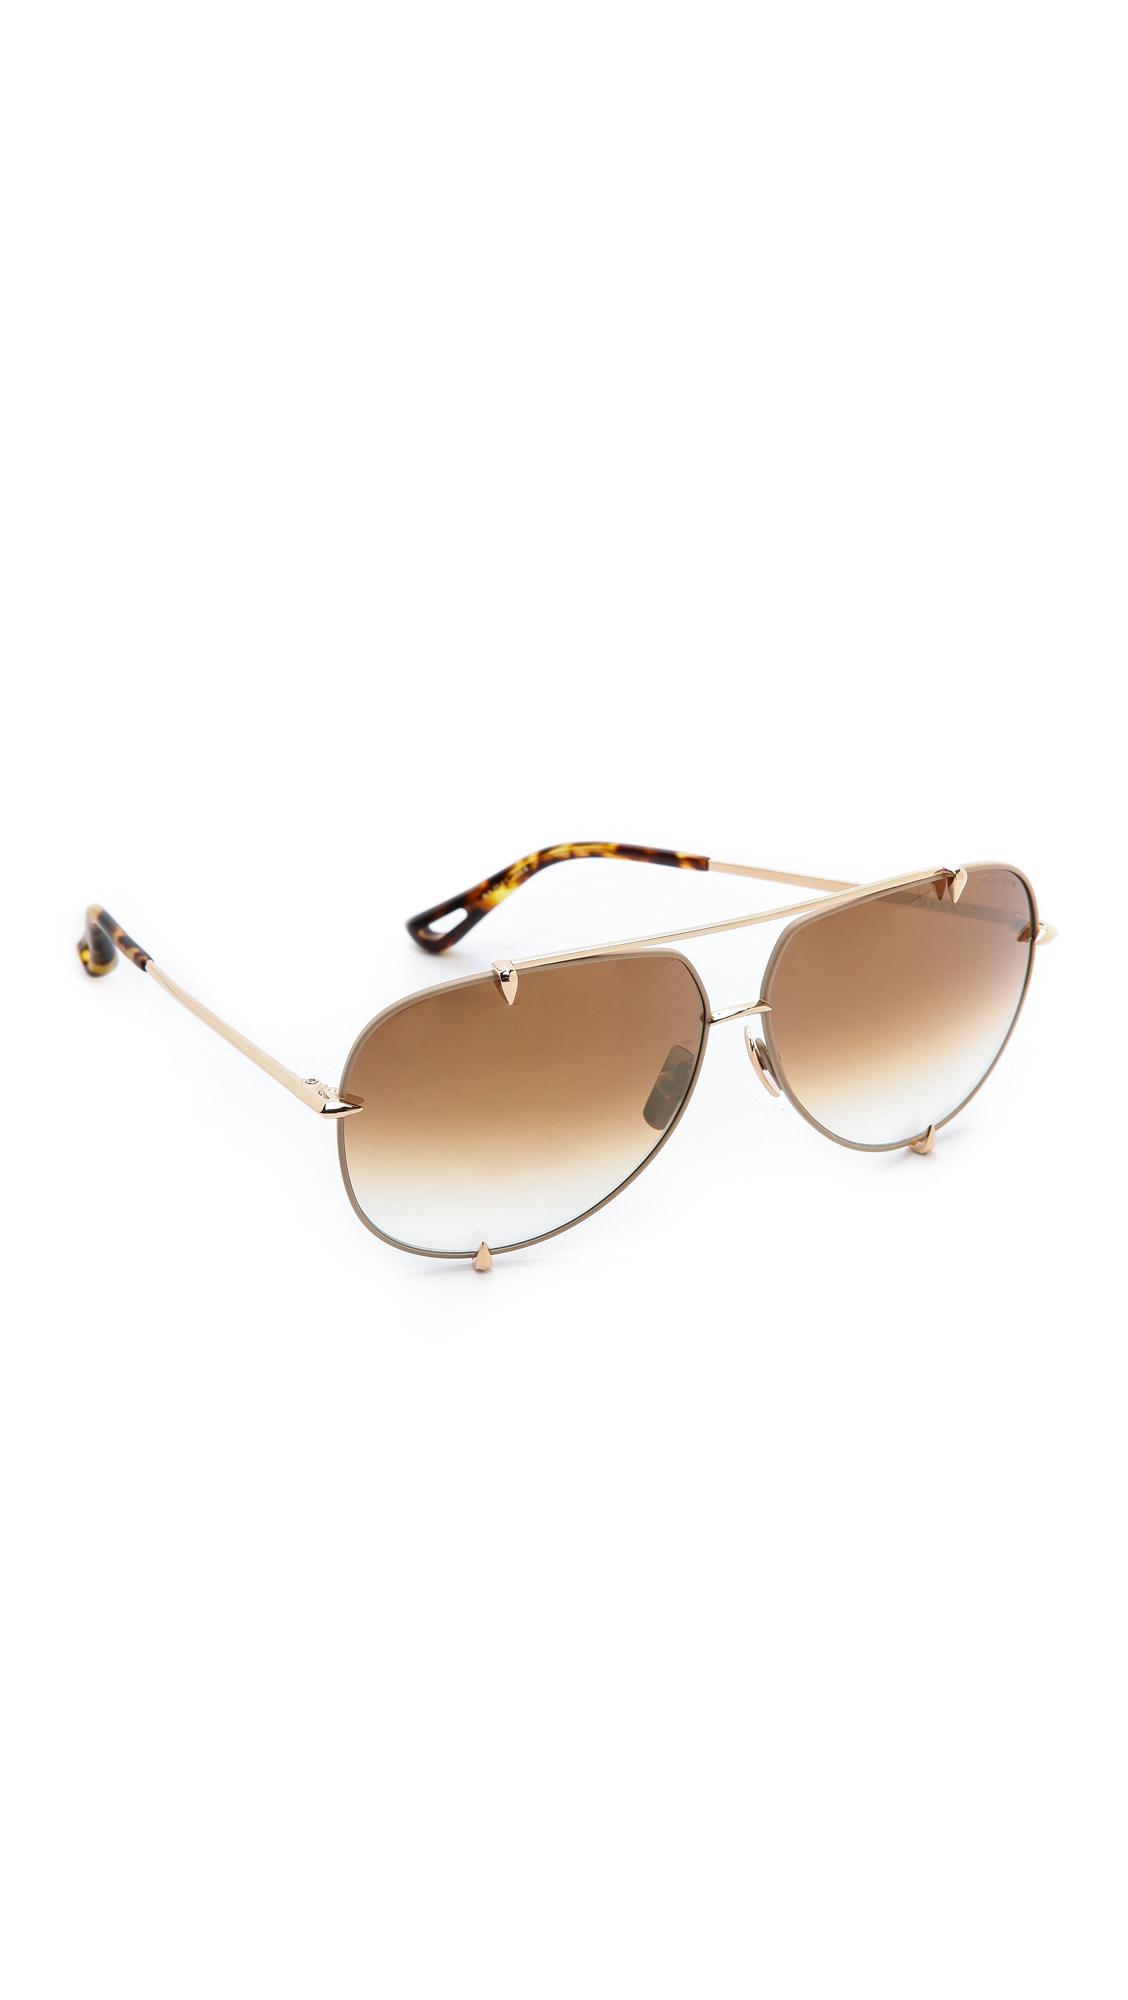 25b087850 DITA Talon Sunglasses - Satin Tan/Gold/Brown To Clear in Metallic - Lyst